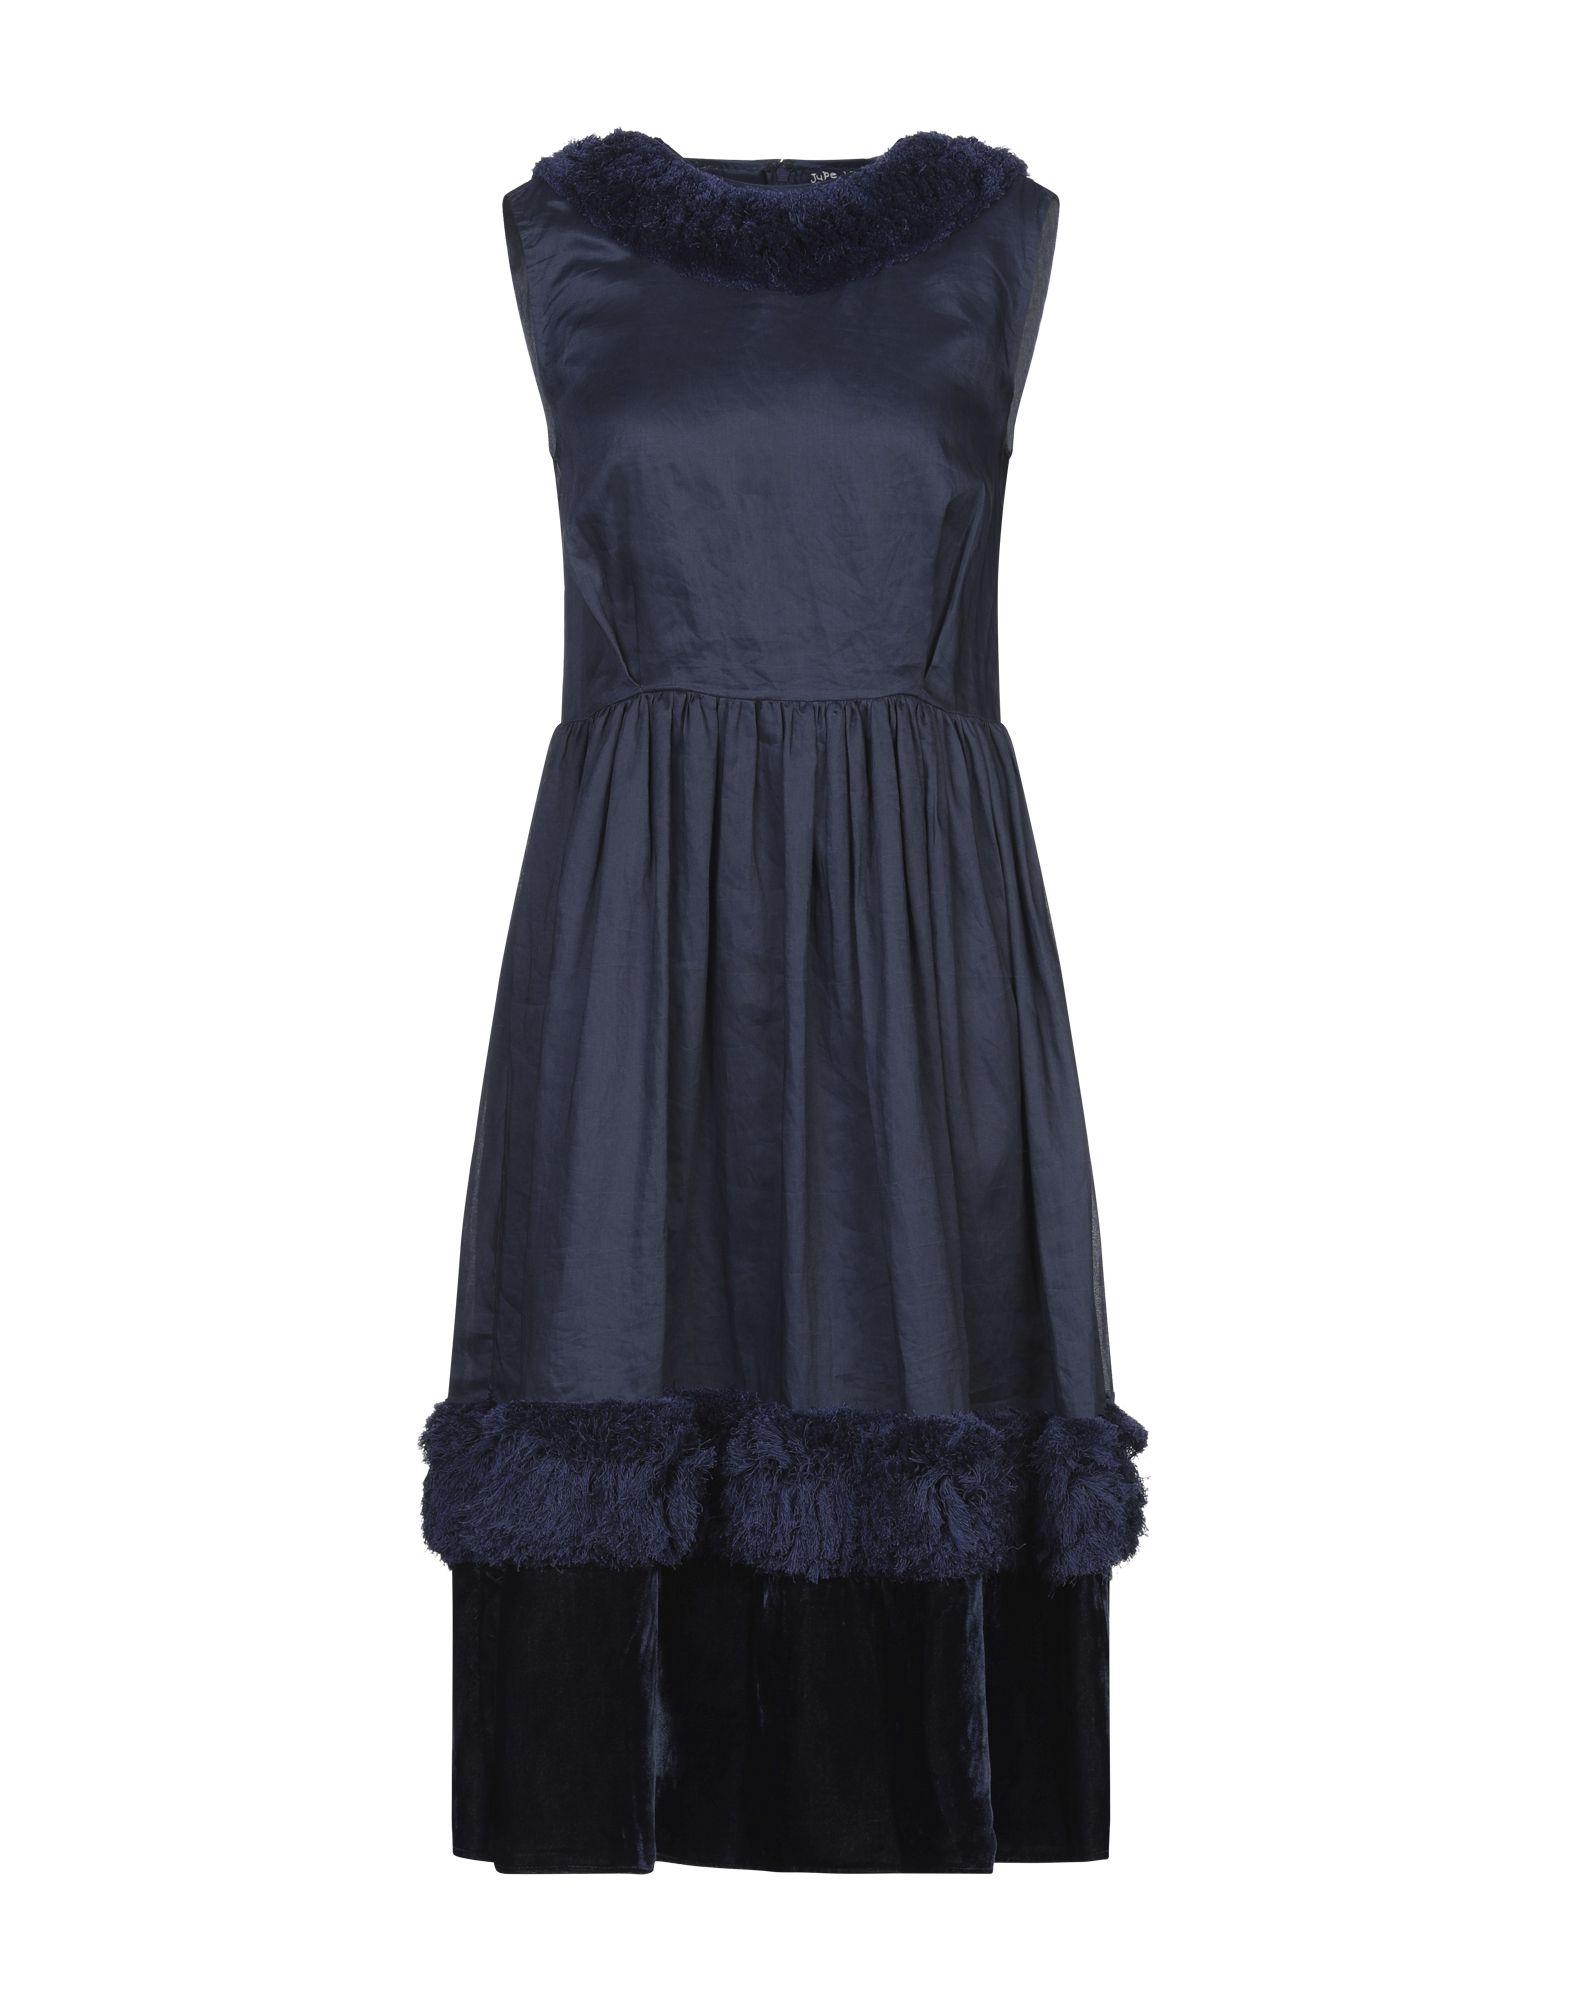 JUPE by JACKIE Платье длиной 3/4 платье jackie smart jackie smart mp002xw1h2d8